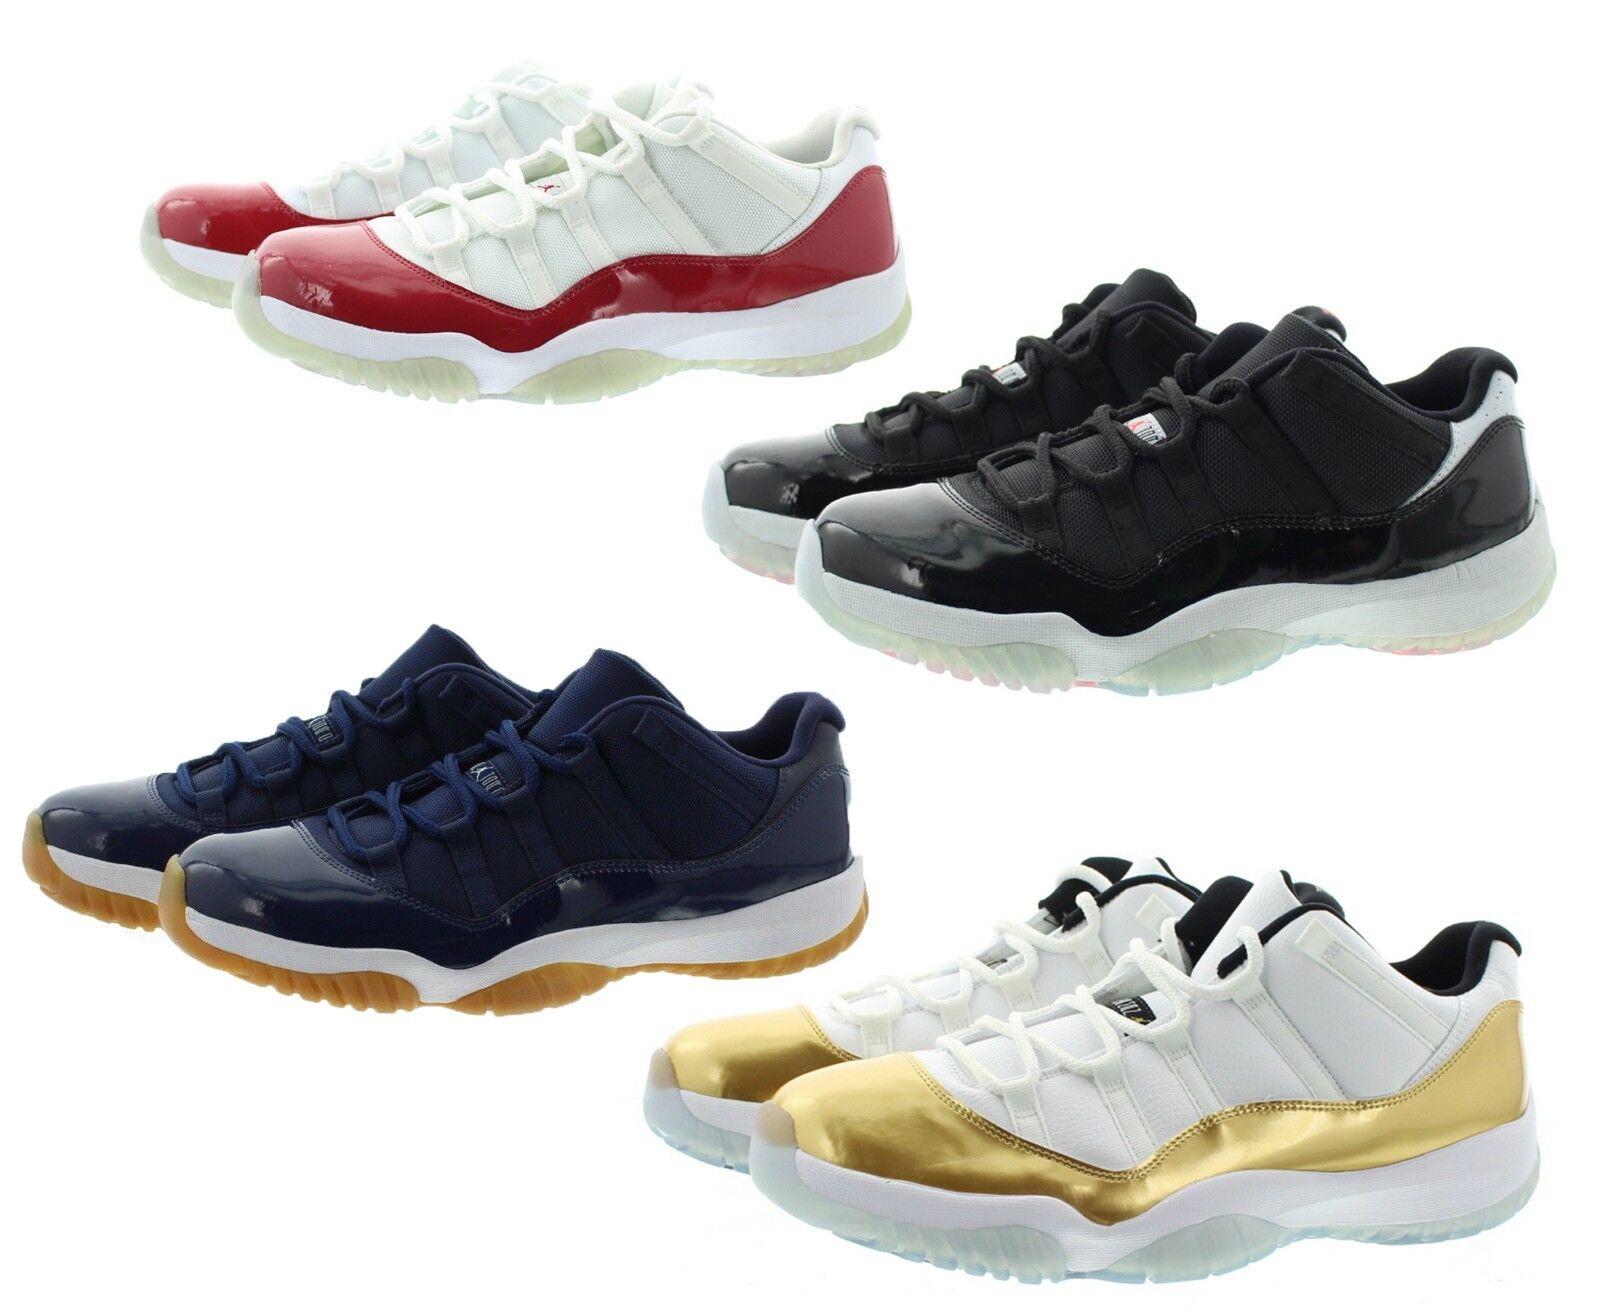 Nike 528895 Mens Air Jordan 11 Retro Shoes Infrared Low Top Basketball Shoes Retro Sneakers d27f6e